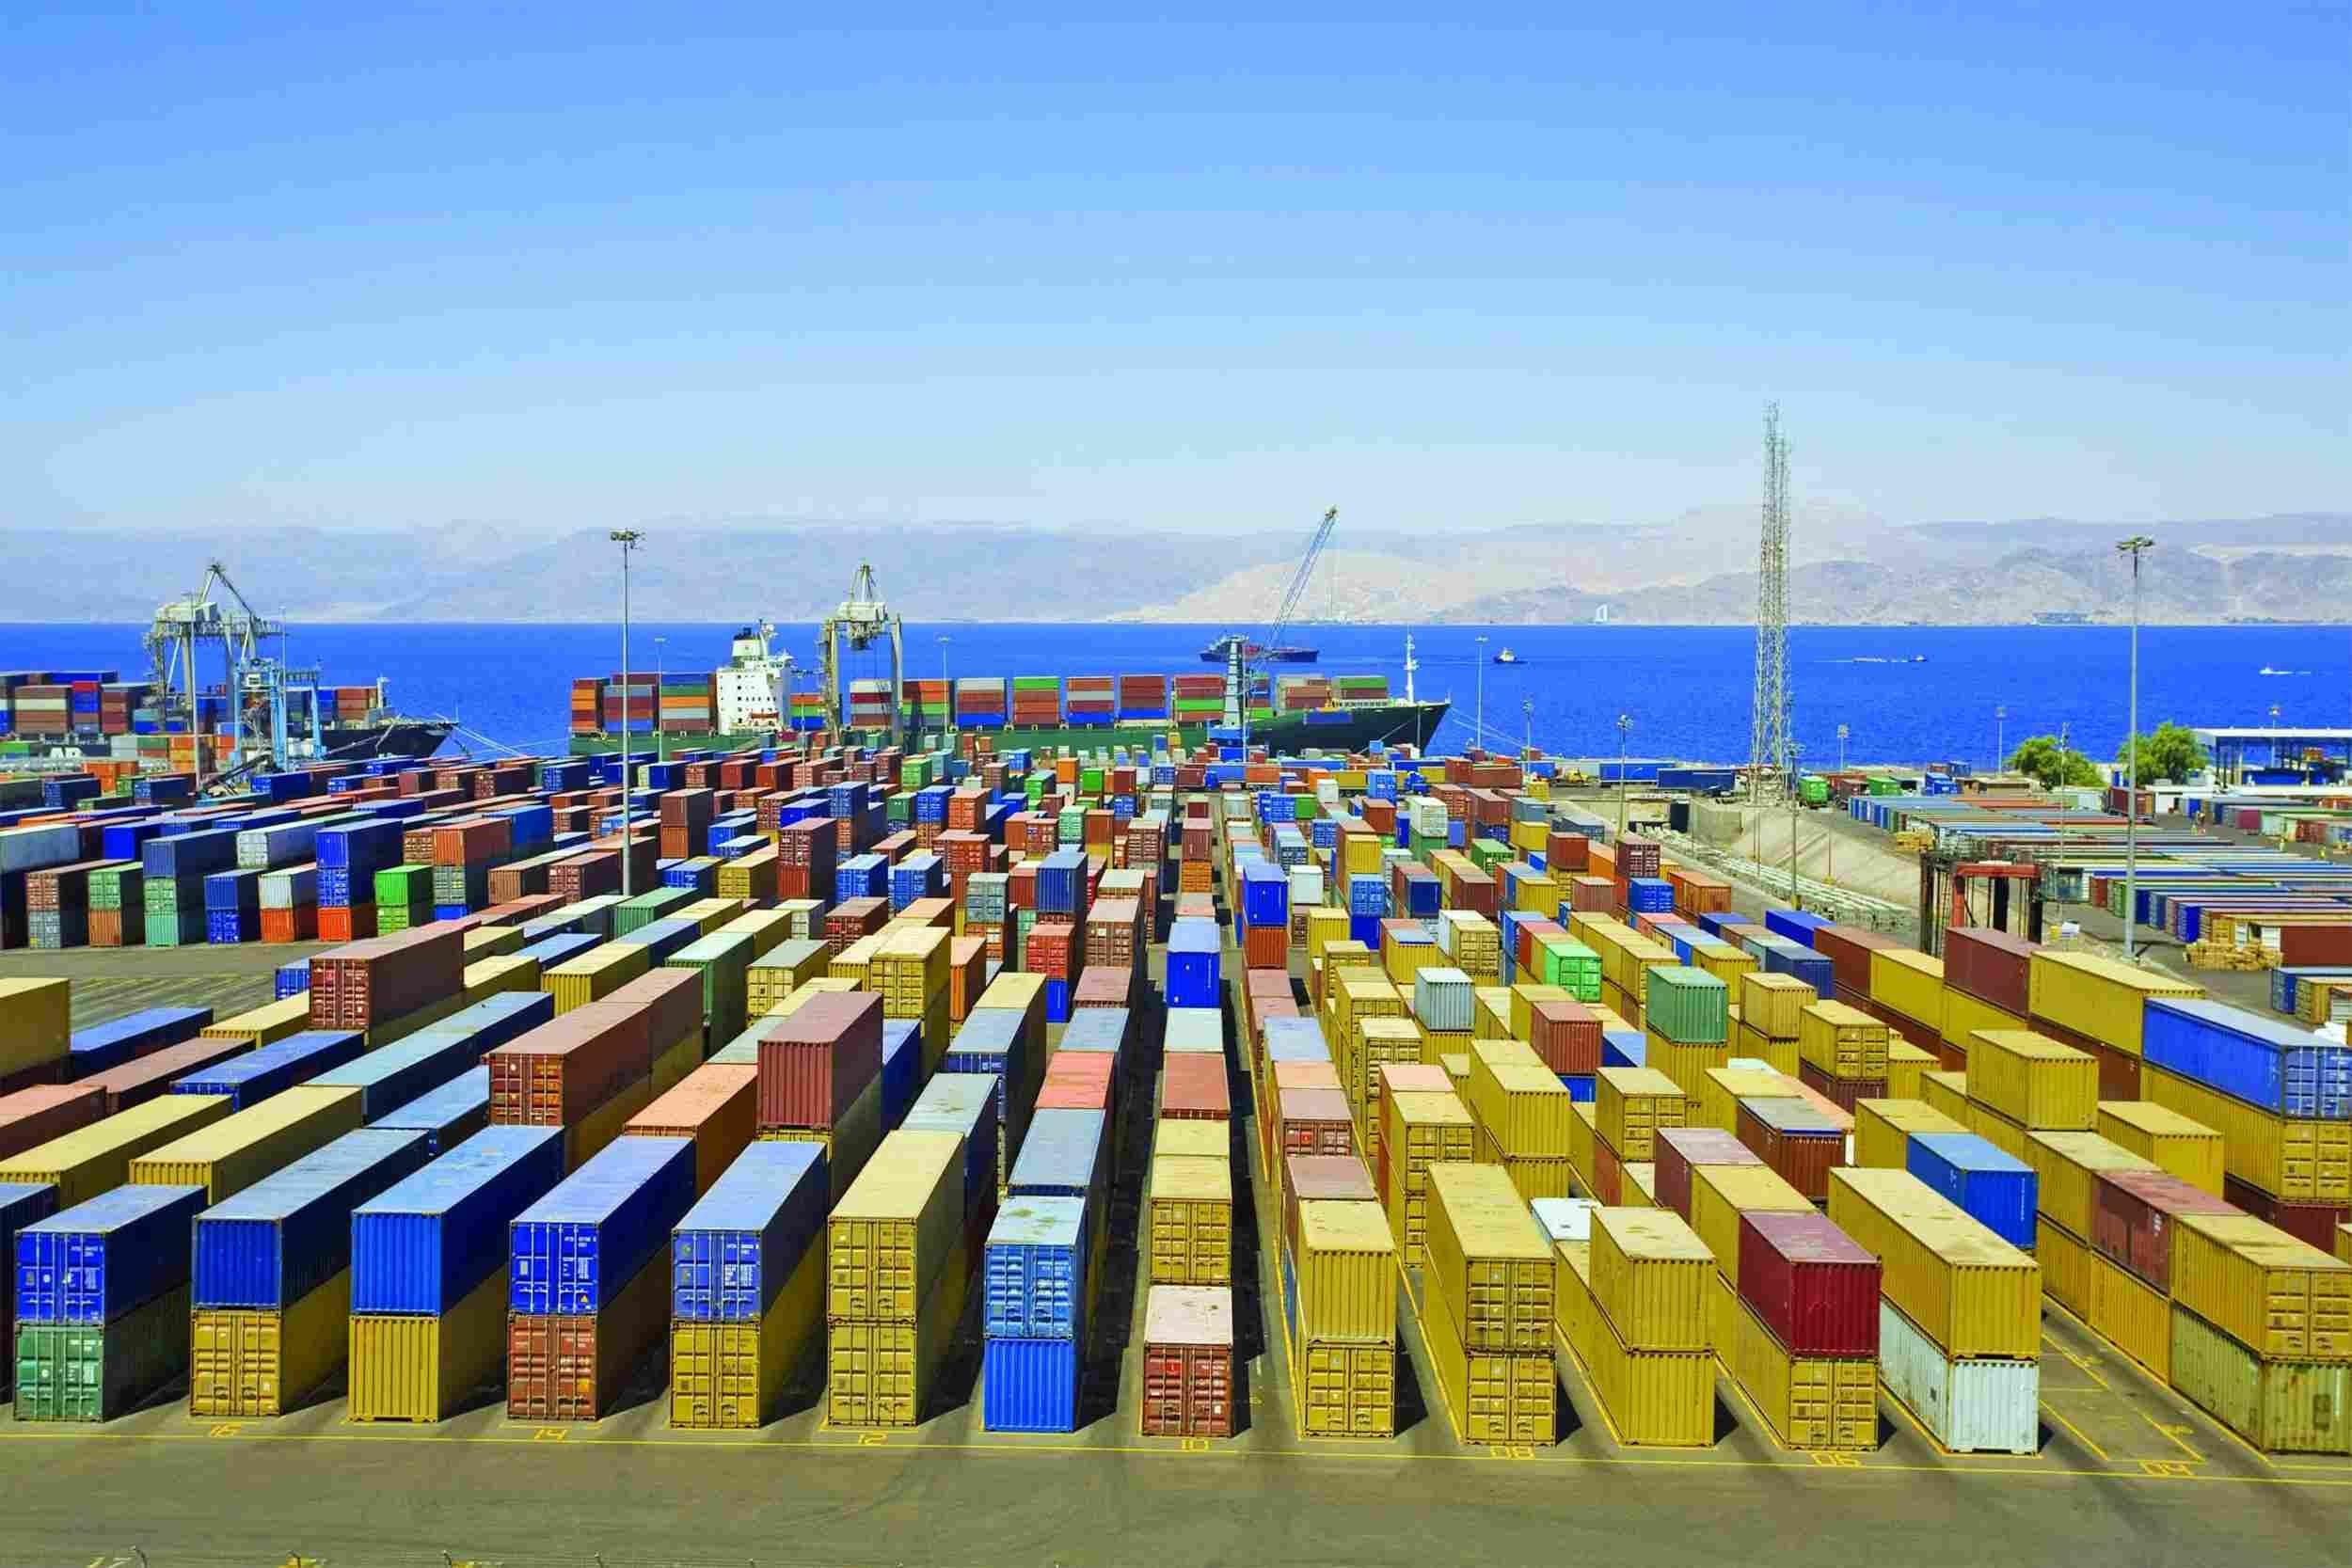 https://aubry-logistique.fr/wp-content/uploads/2015/09/Harbor-warehouse.jpg